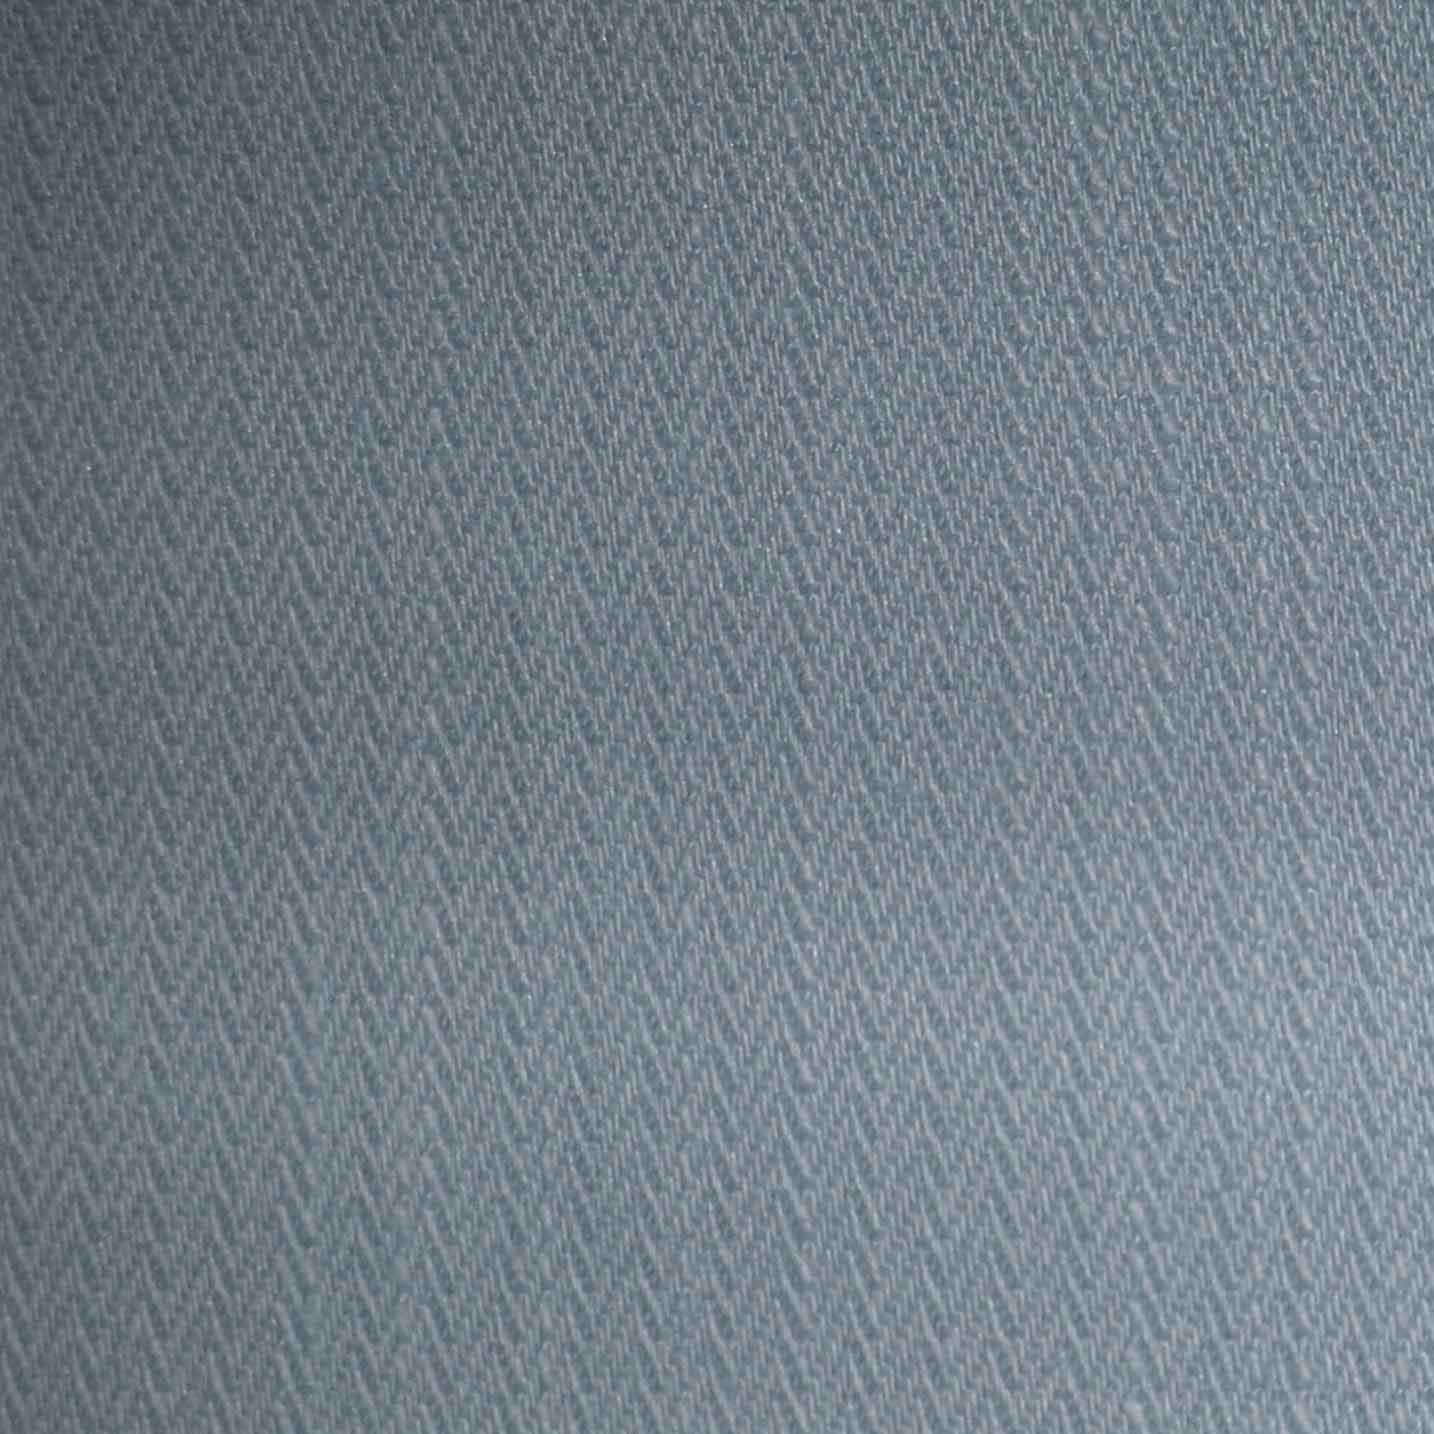 China Cotton Twill Herringbone 201670D13266   China Cotton Fabric